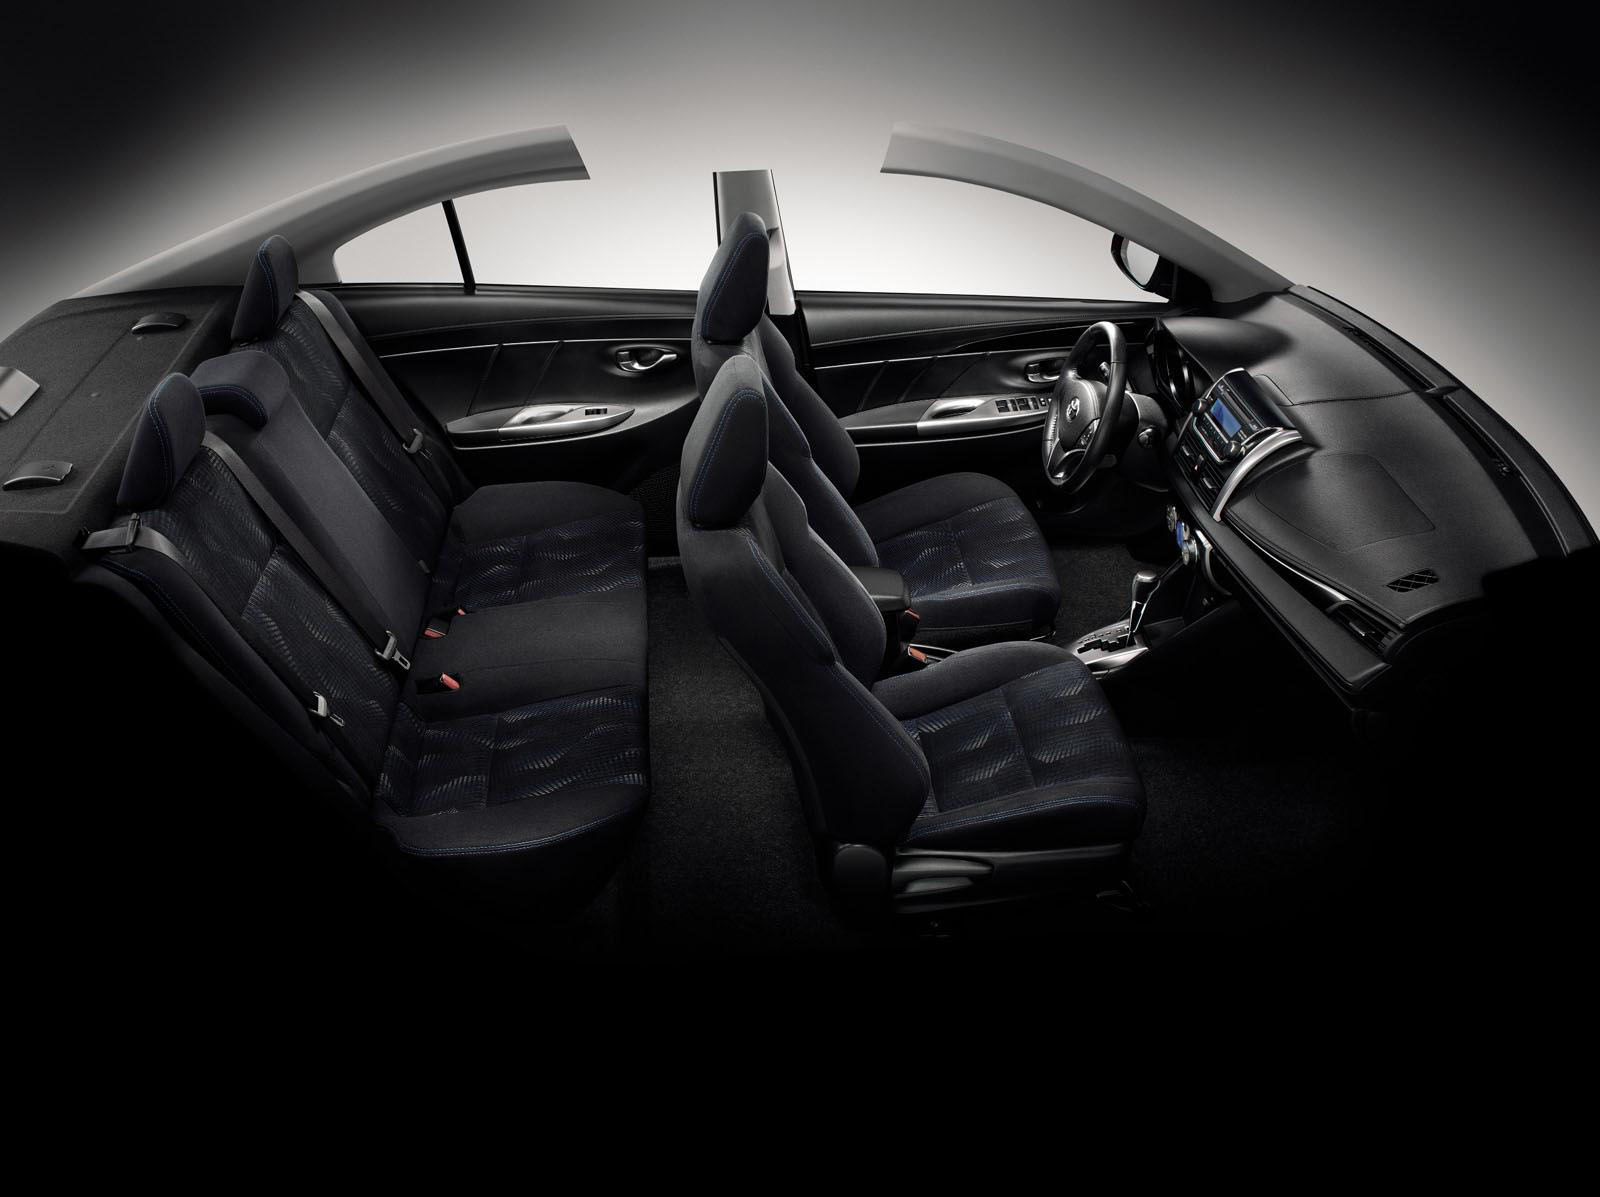 novo Toyota Vios 2014 interior 1